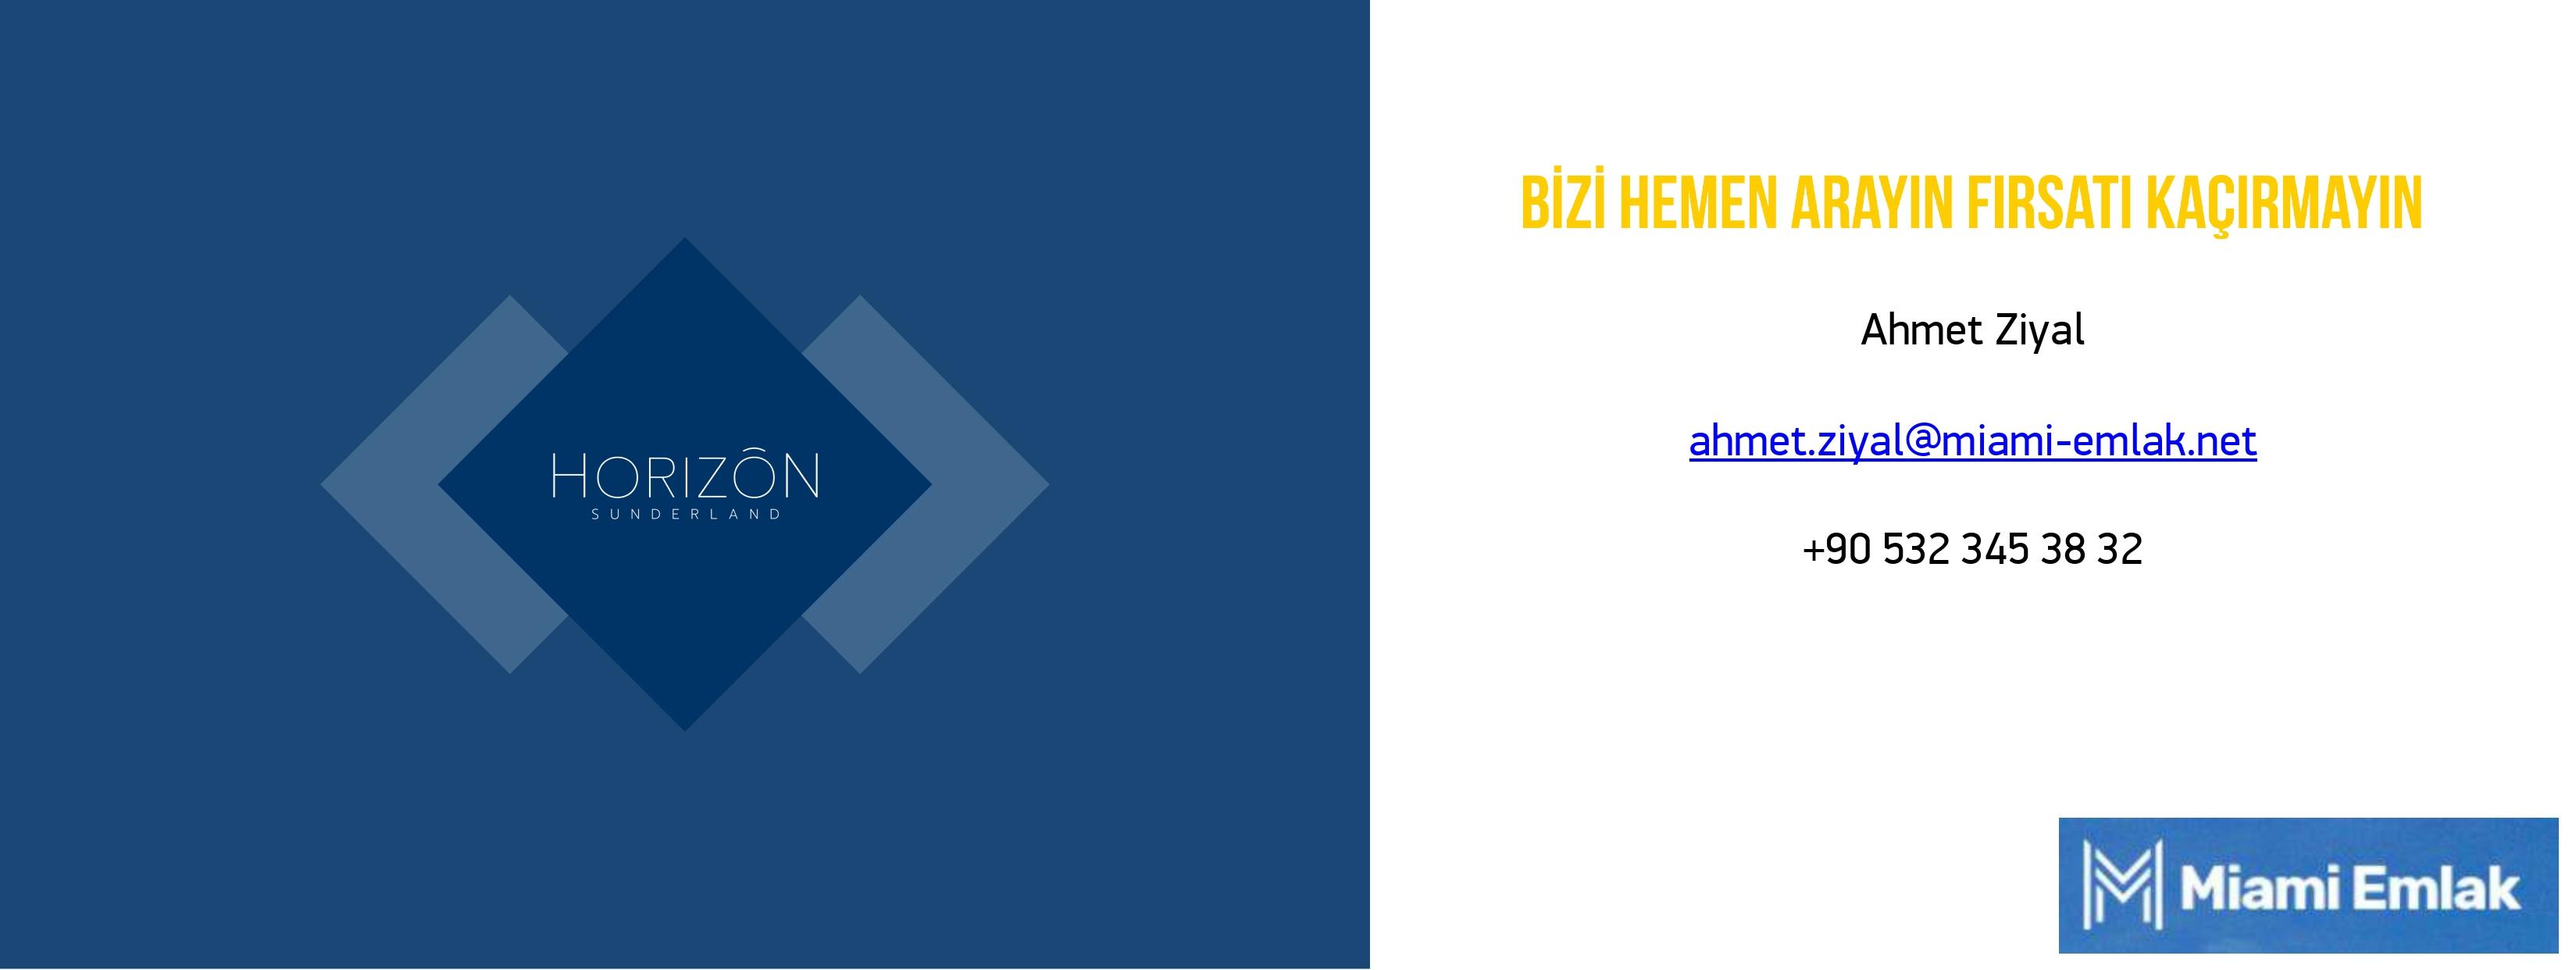 Horizon Sunderland -Ahmet Ziyal_v02_page-0001